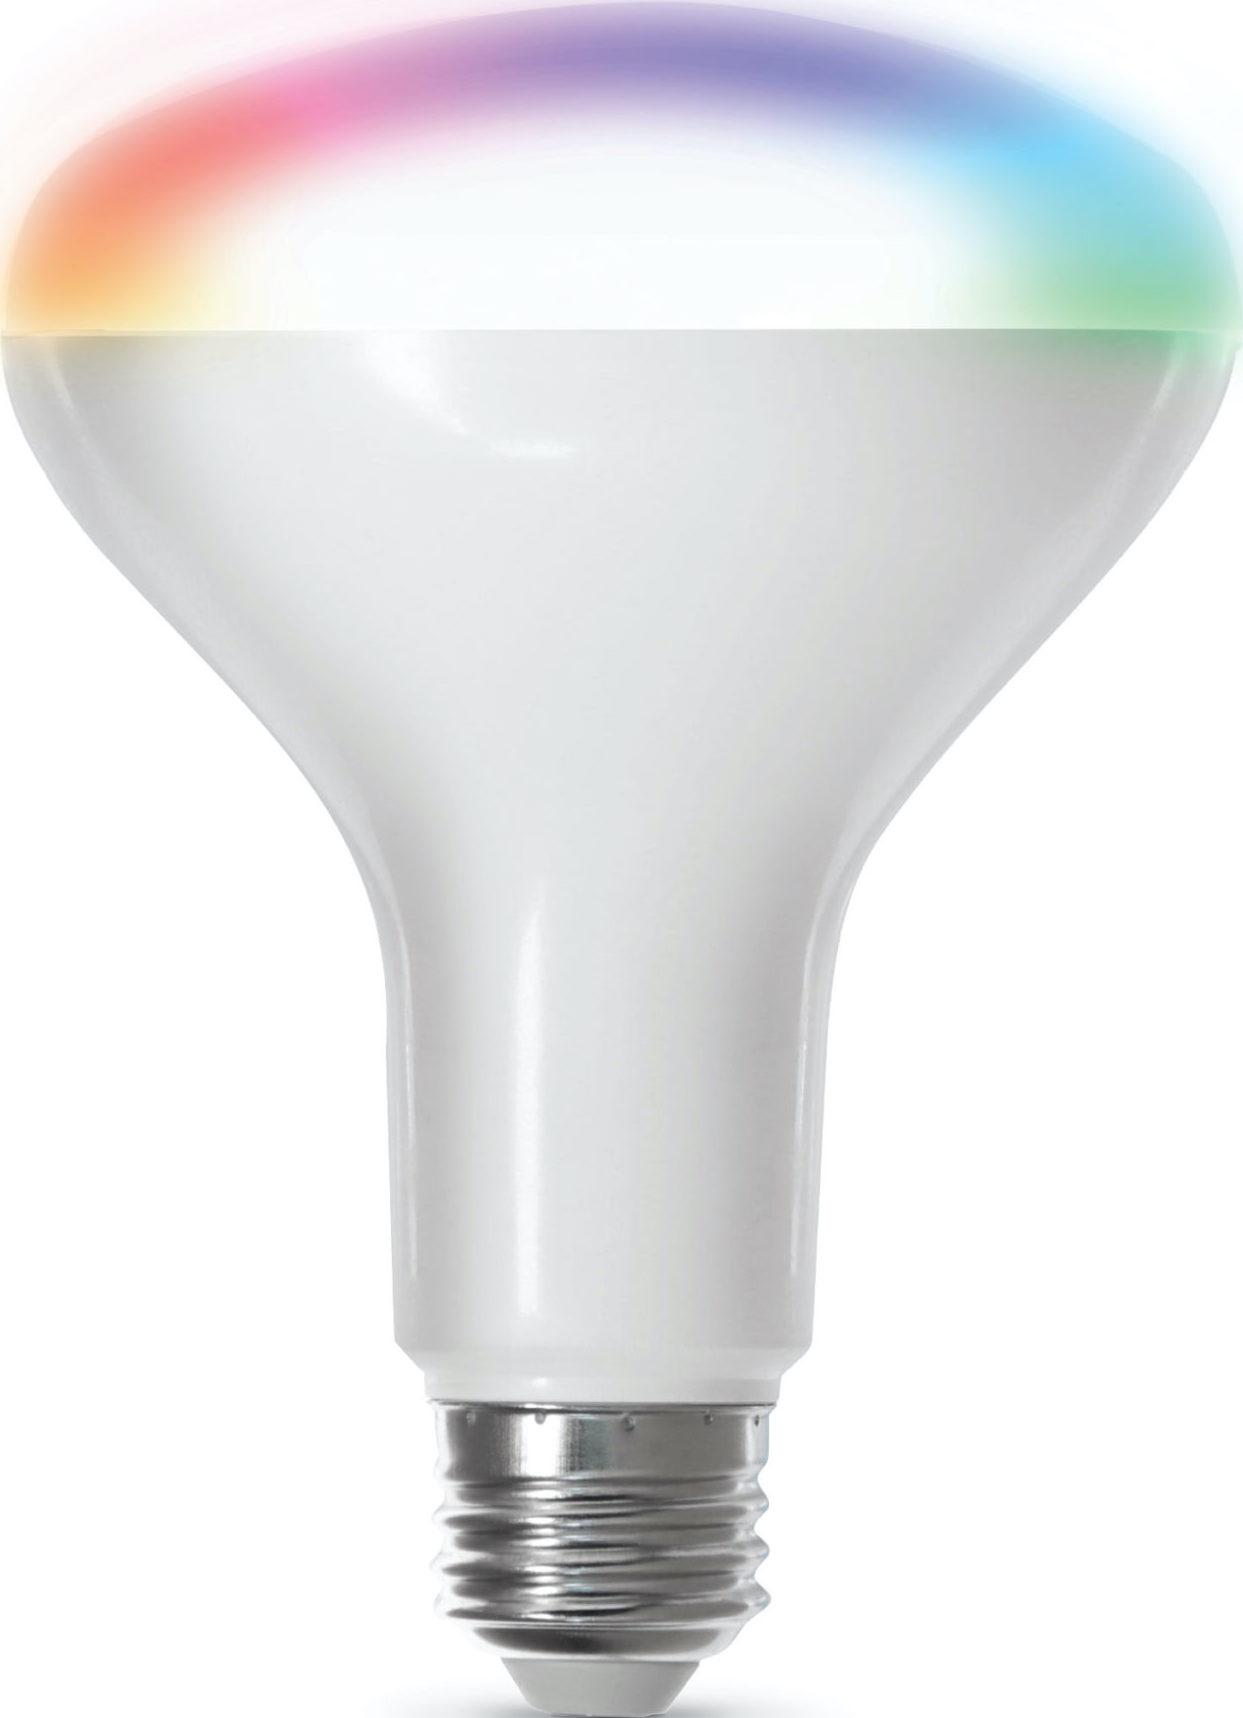 The best smart bulbs of 2020